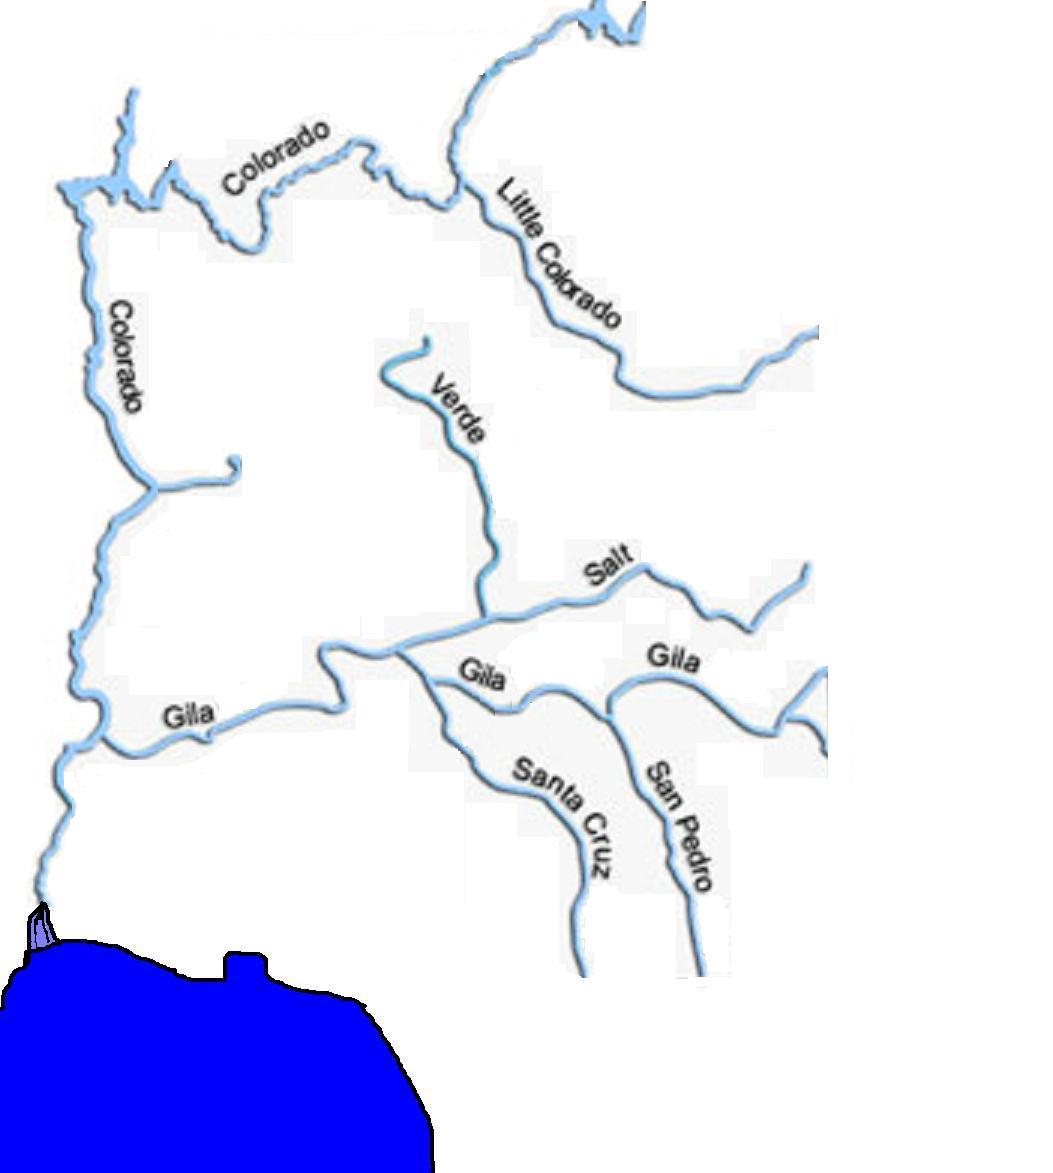 Old School Psionics River Valleys Civilization - 5 major rivers